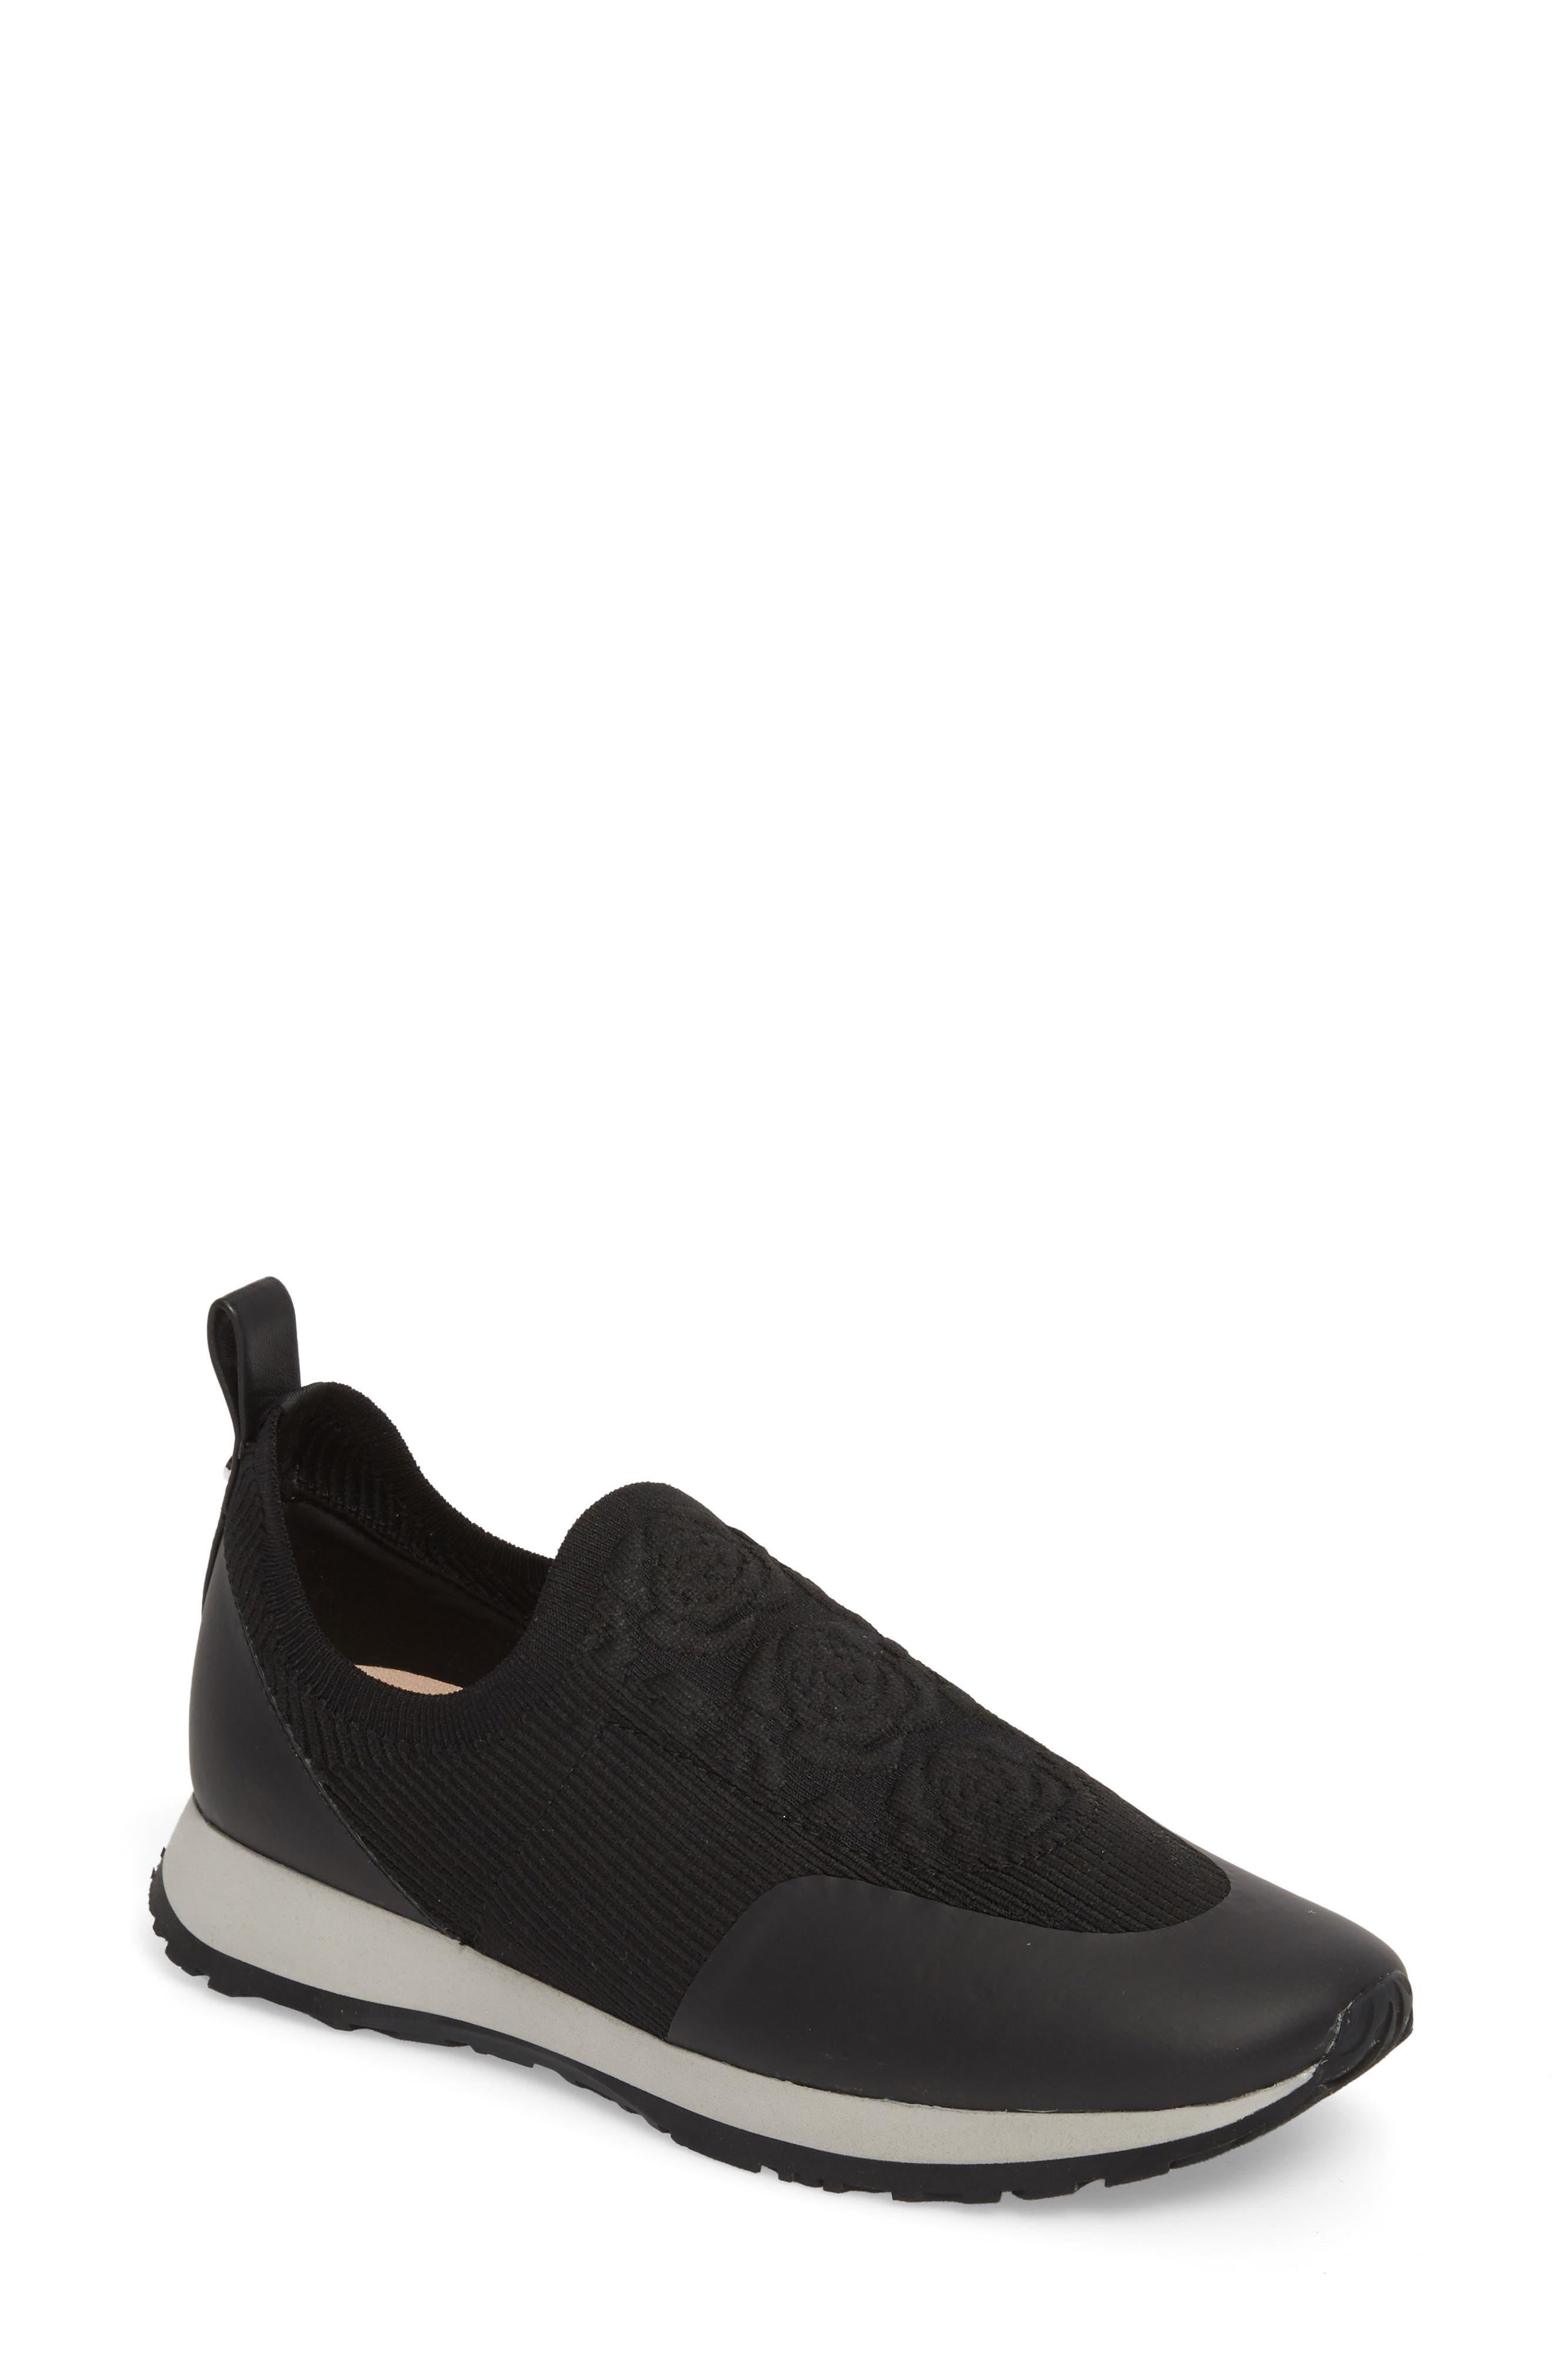 Cara Slip-On Sneaker,                         Main,                         color, Black Fabric